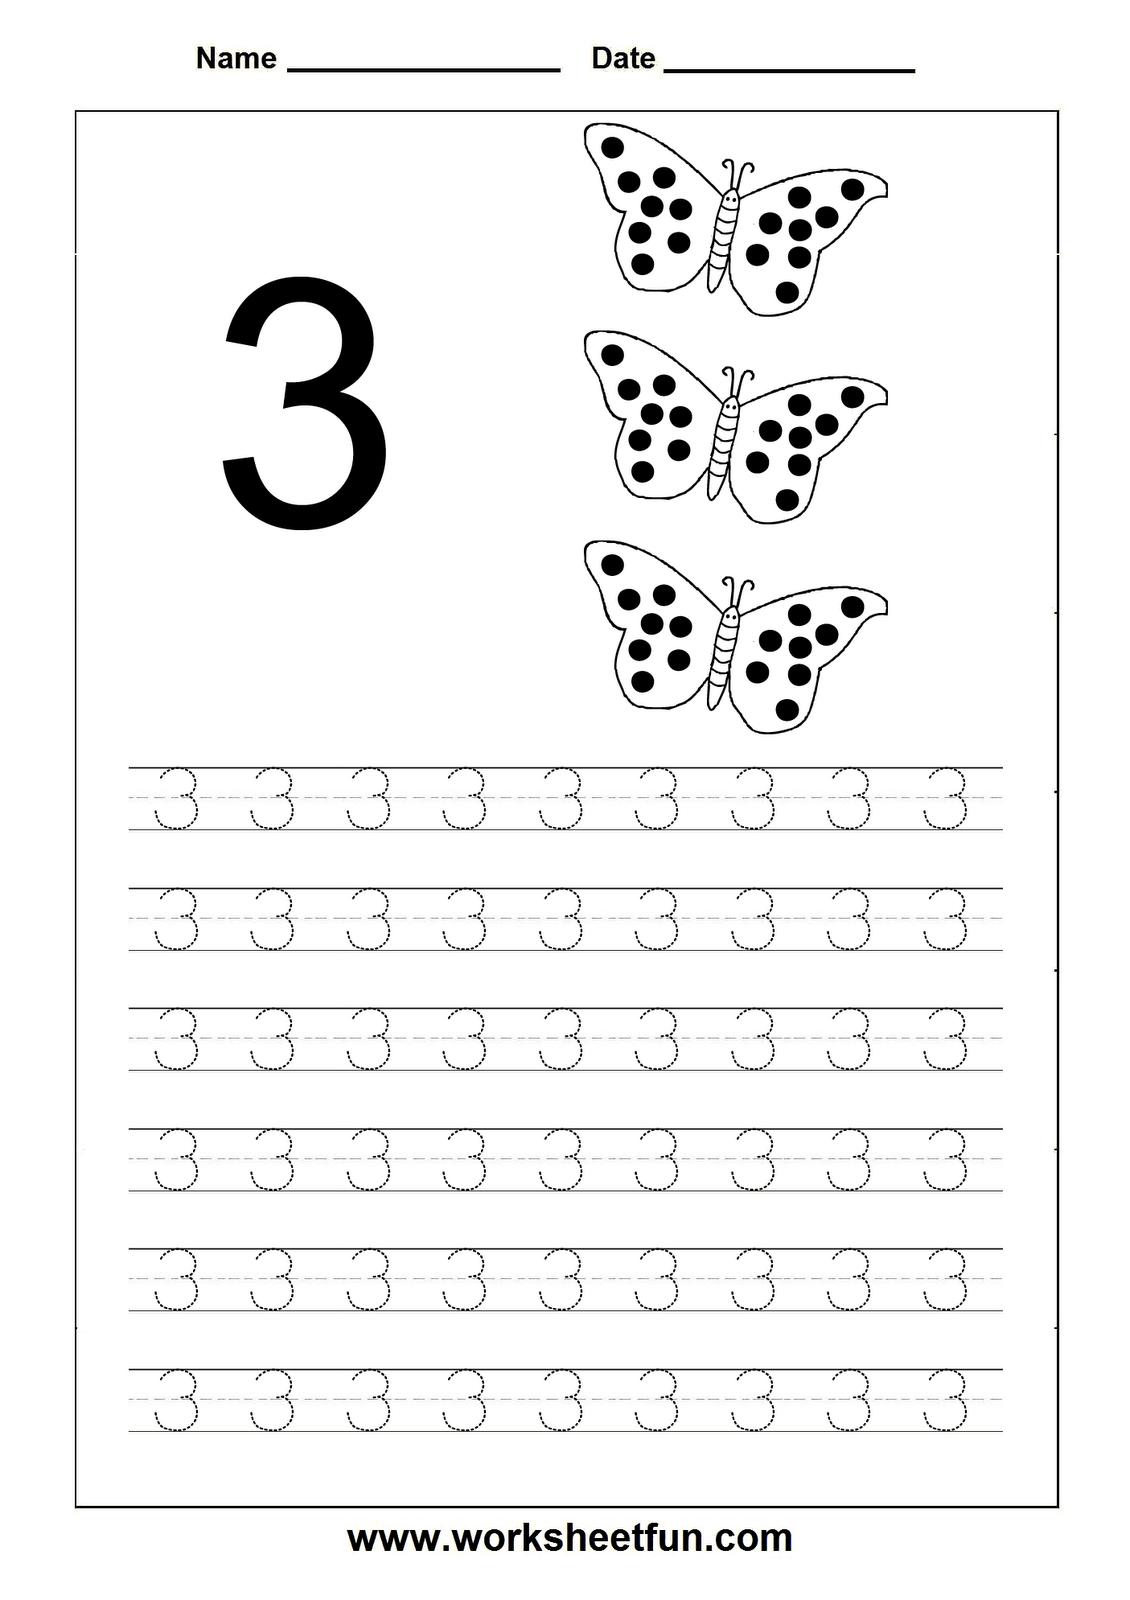 Number Tracing 3 | Number tracing, Worksheets, Preschool